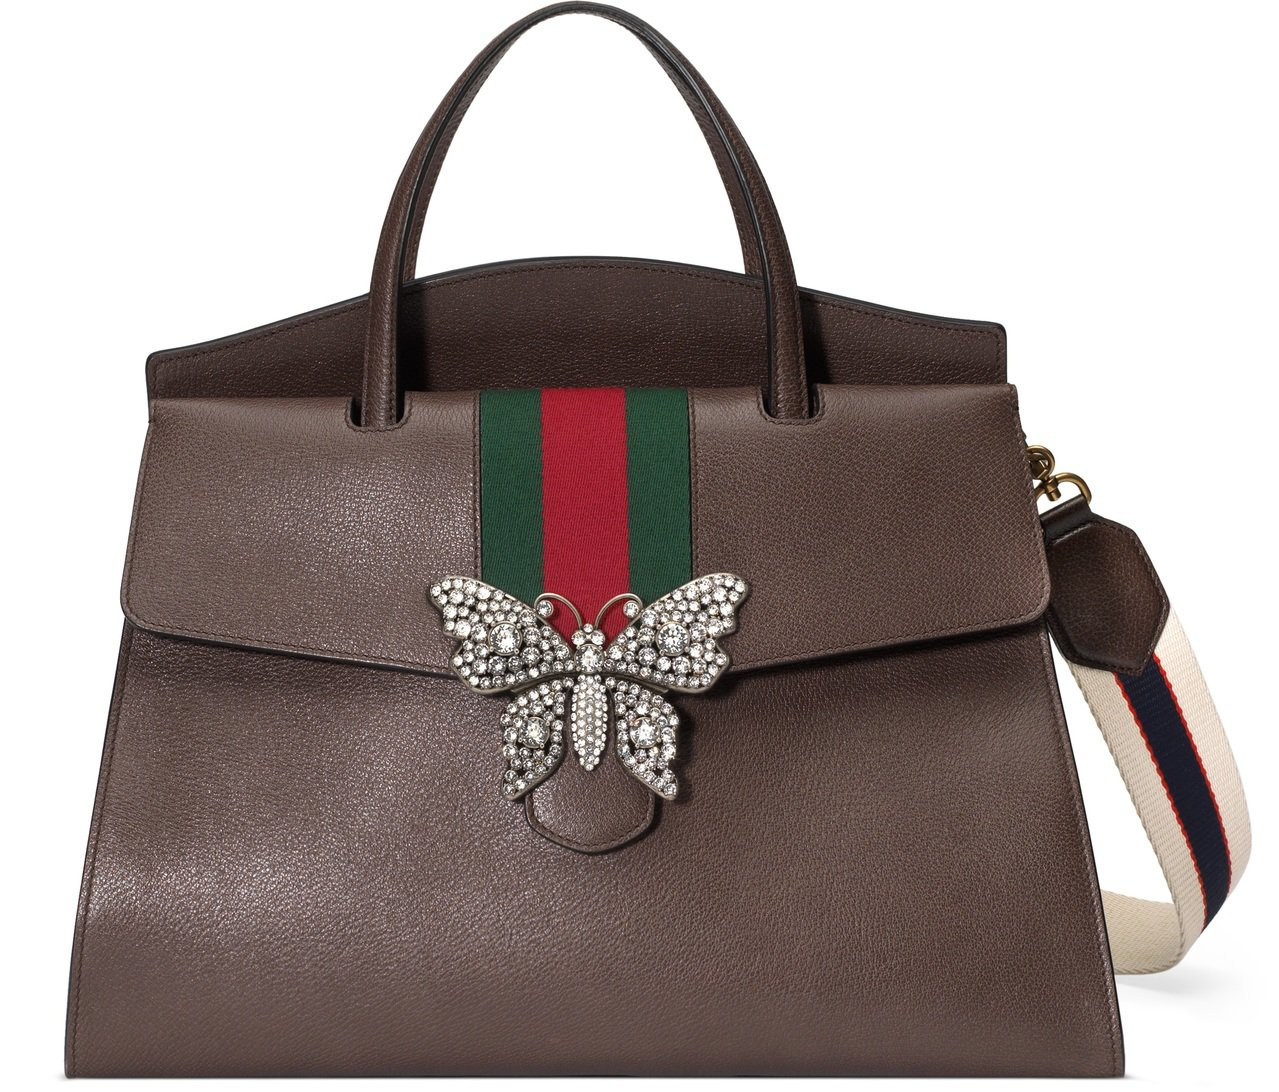 GucciTotem 水鑽蝴蝶裝飾提包,NT$ 153,900(大)。